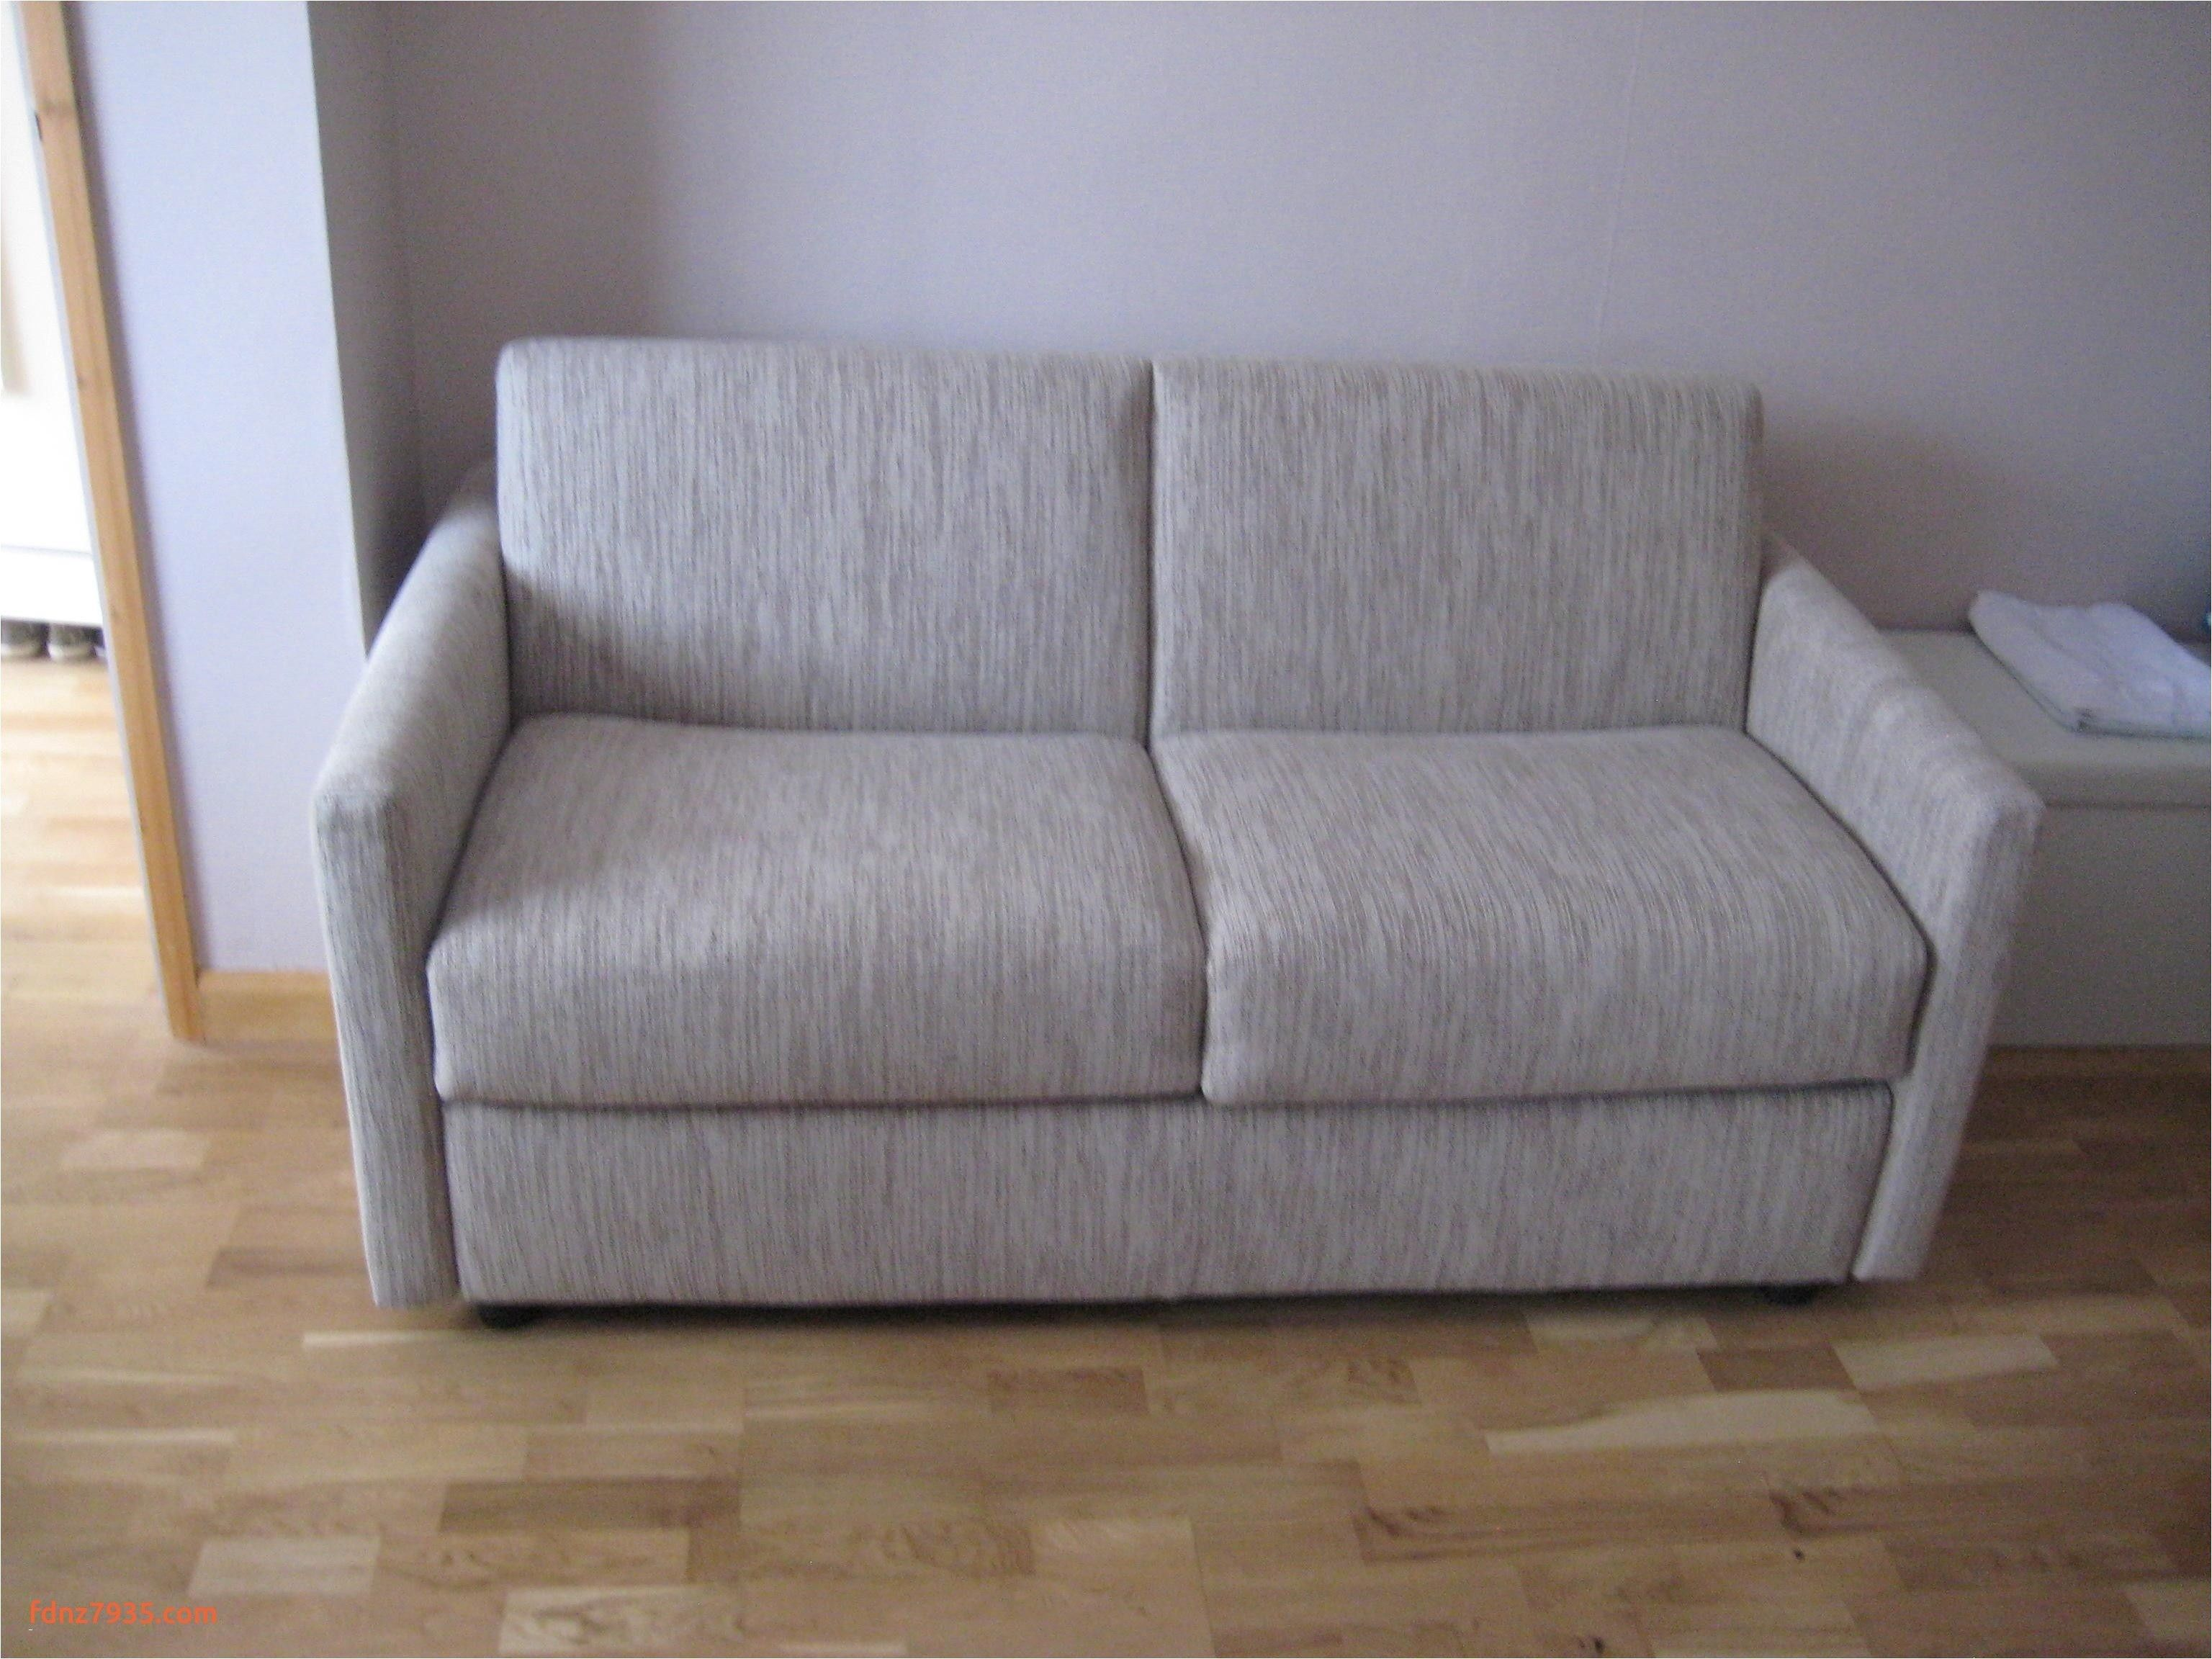 28 Ikea Small sofas Uk Decoracion de interiores